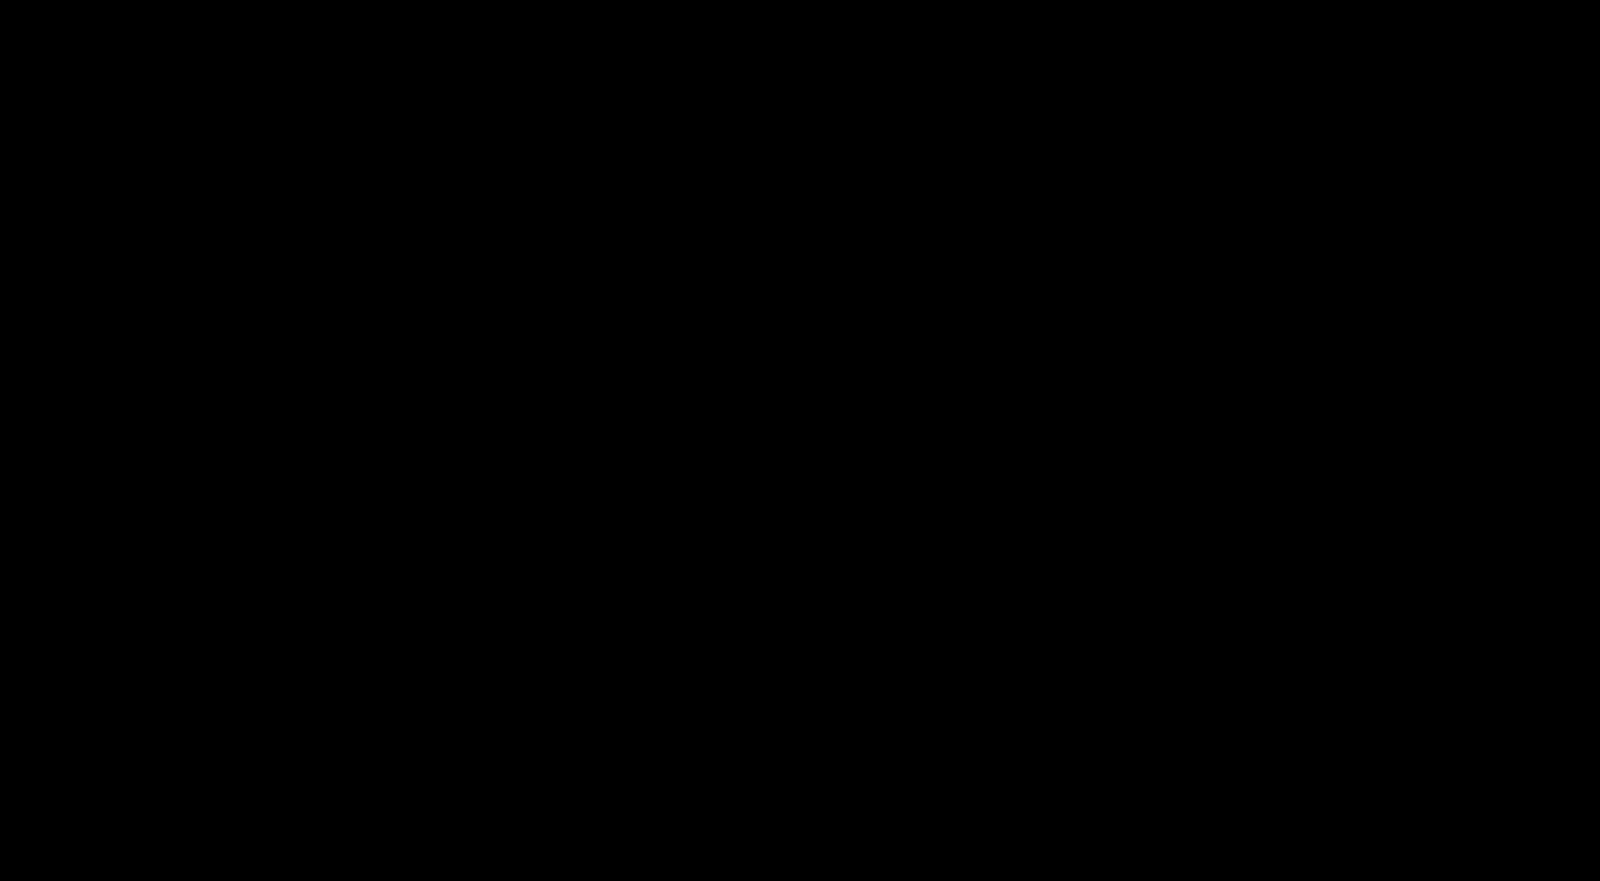 Kakashi Lineart : Naruto lineart favourites by vika on deviantart